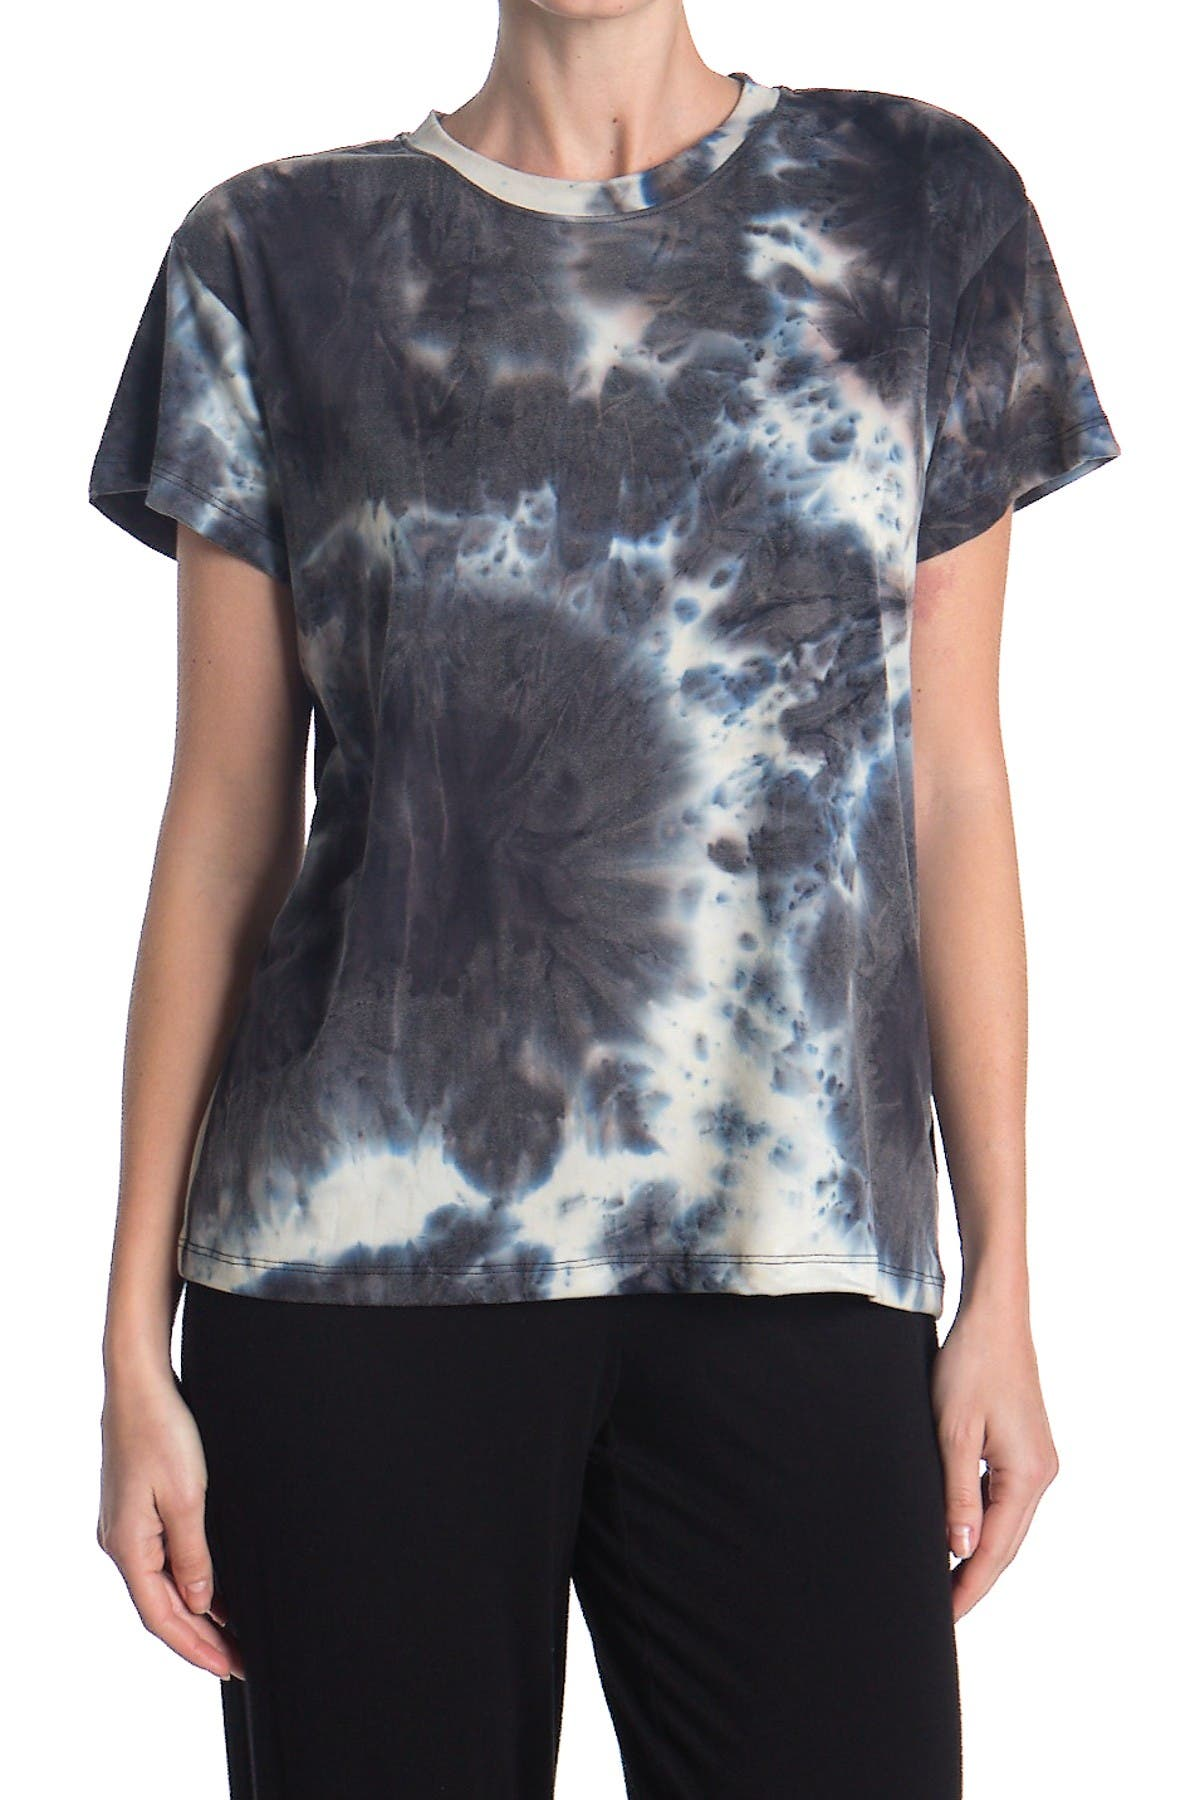 Image of Socialite Short Sleeve Tie Dye Print Boxy T-Shirt